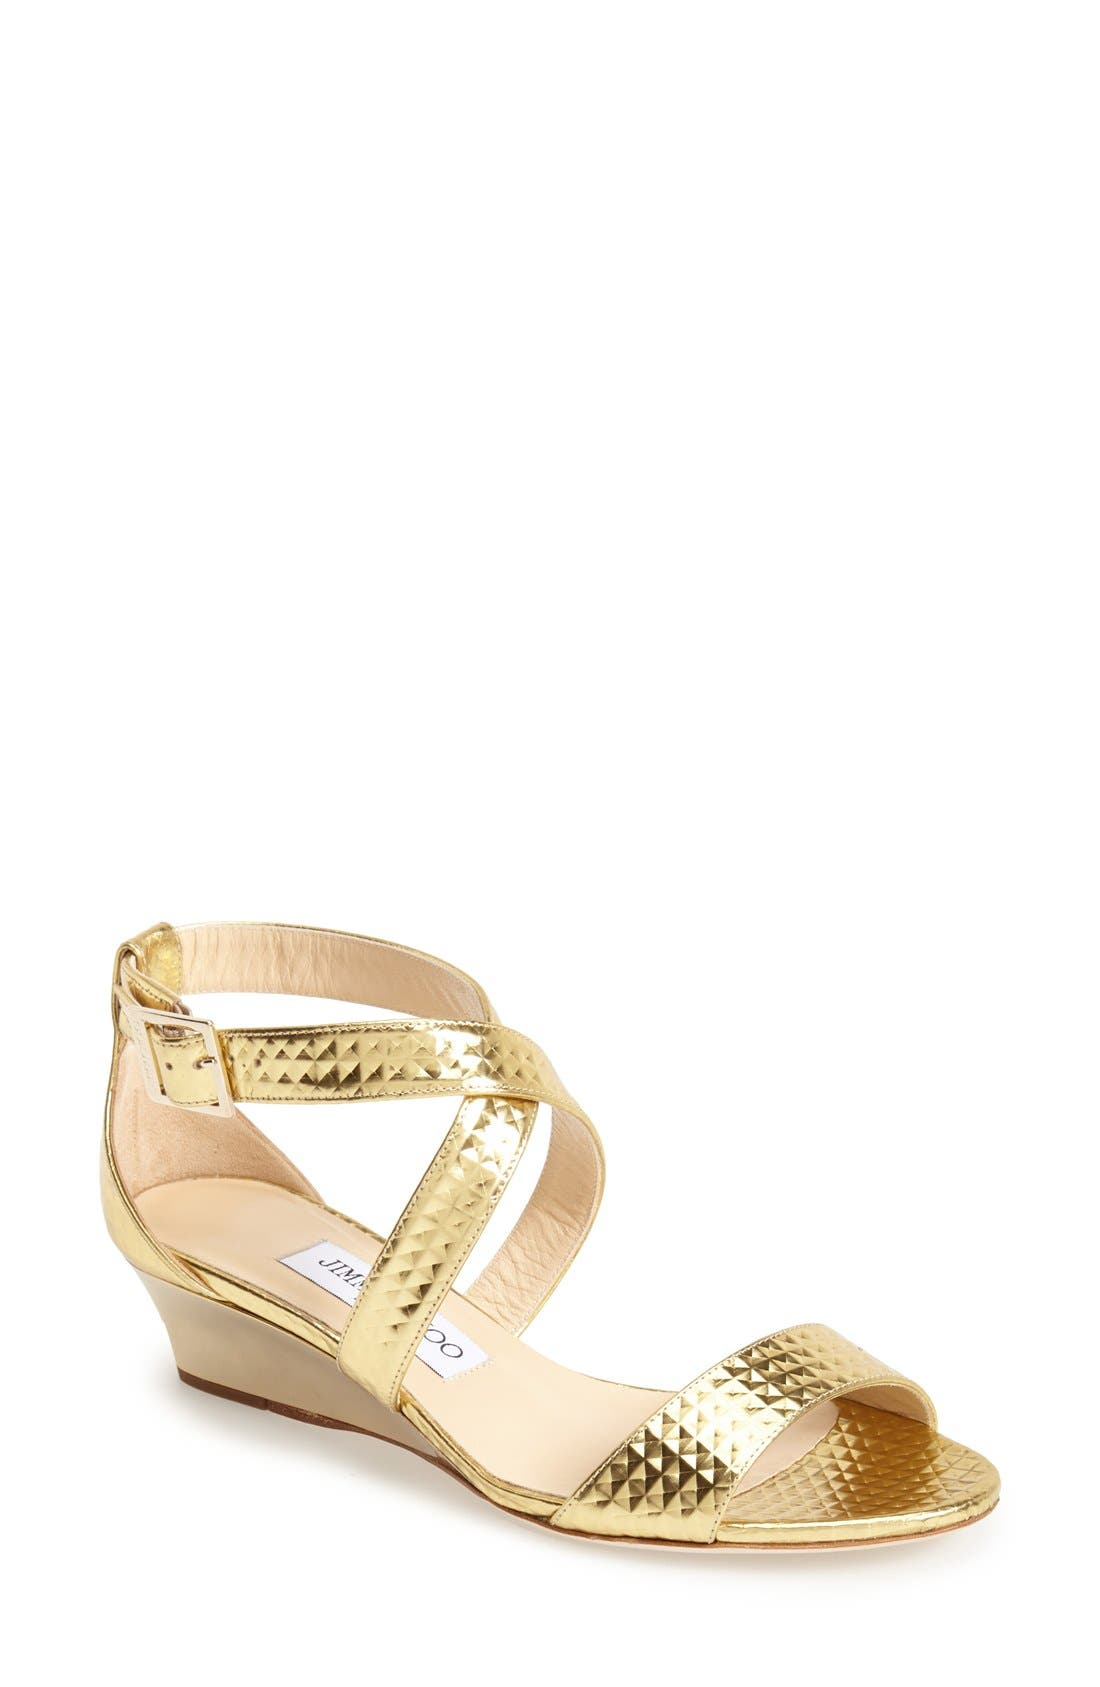 Main Image - Jimmy Choo 'Chiara' Leather Sandal (Women)